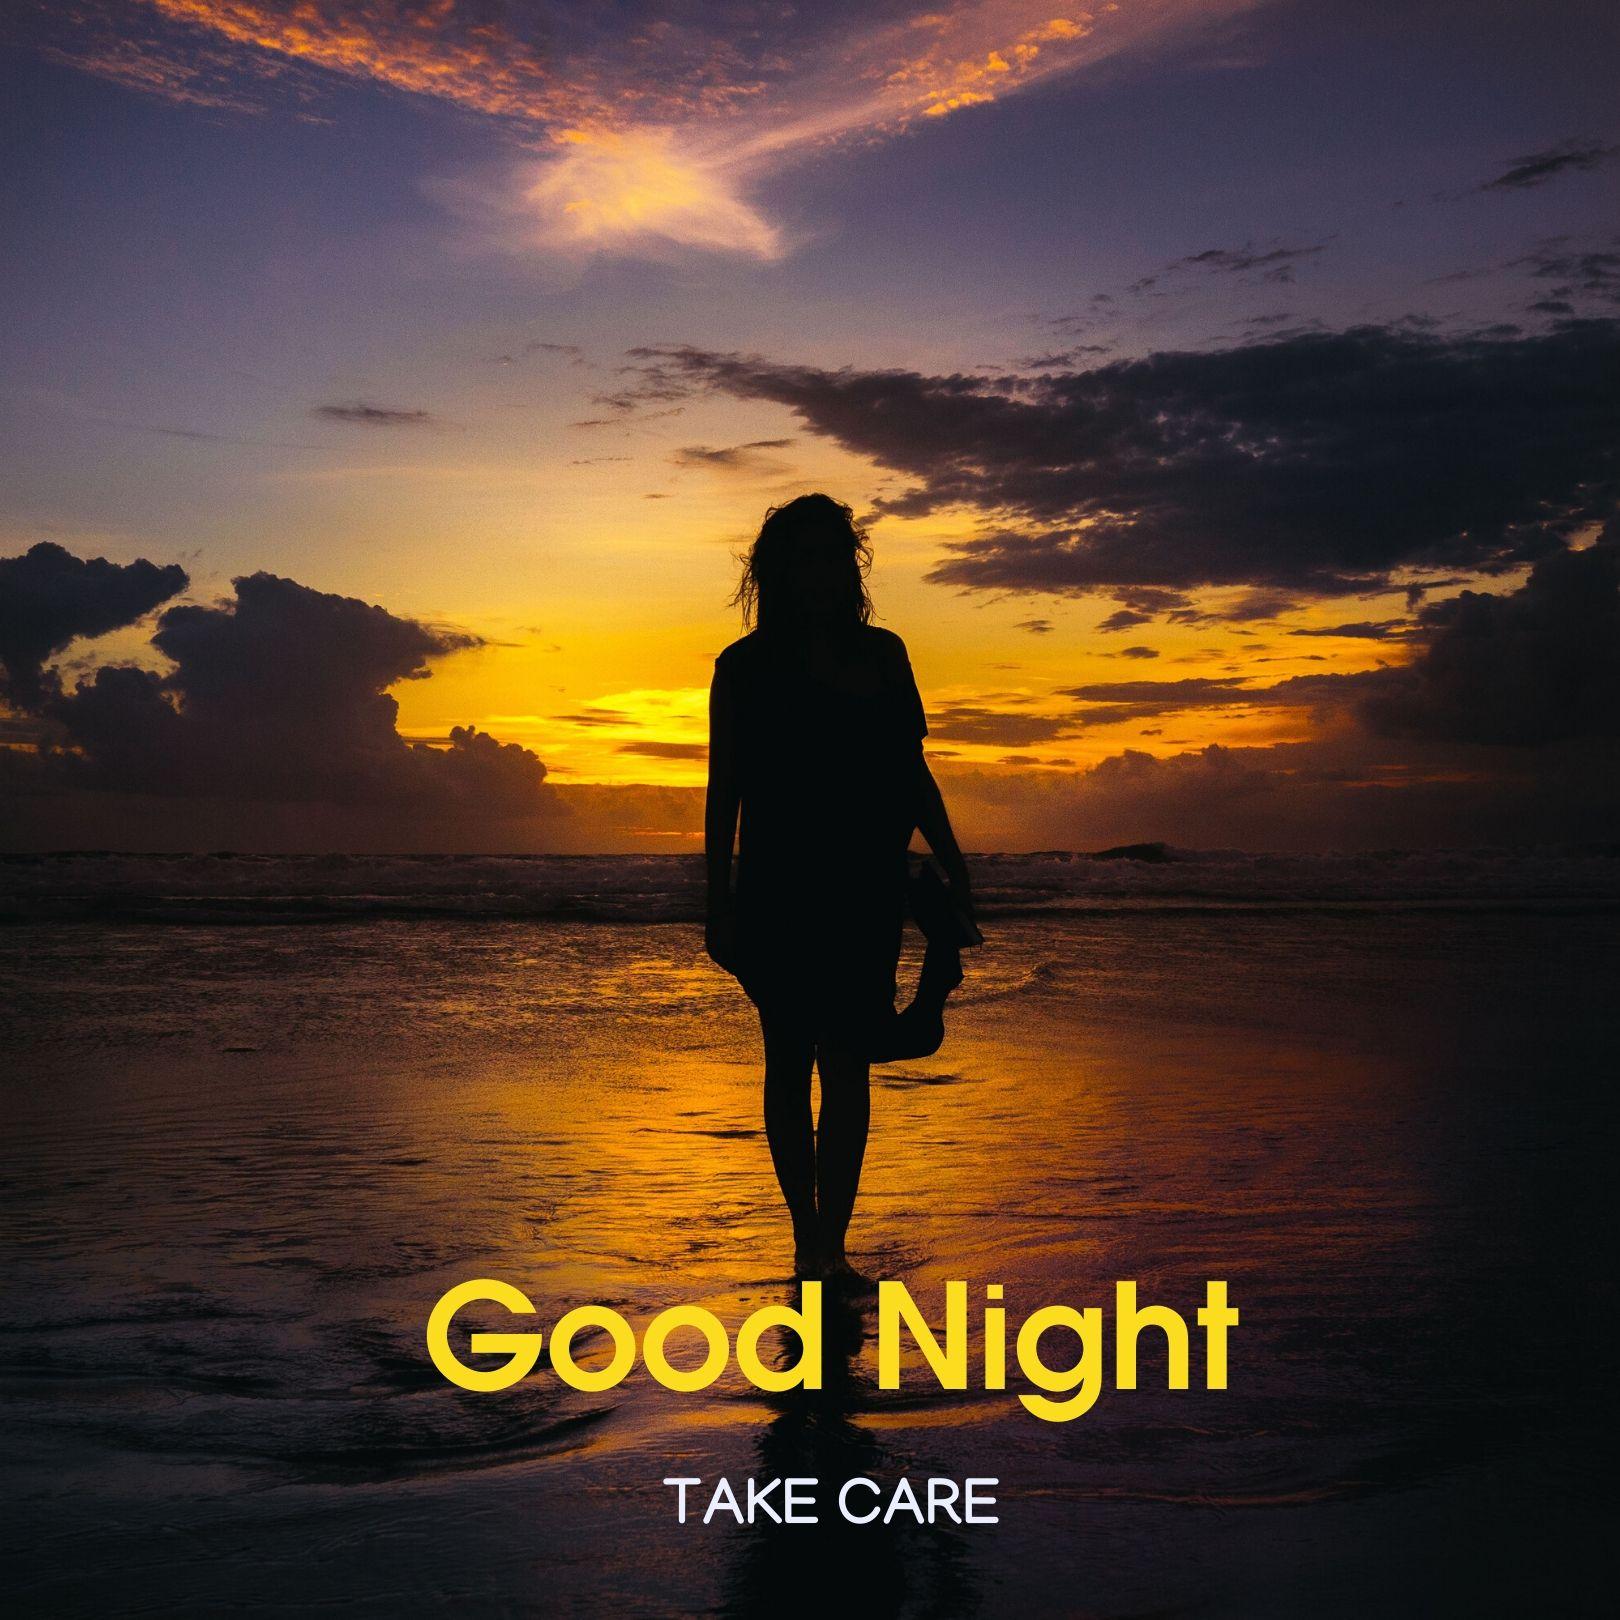 Good Night take care image hd full HD free download.